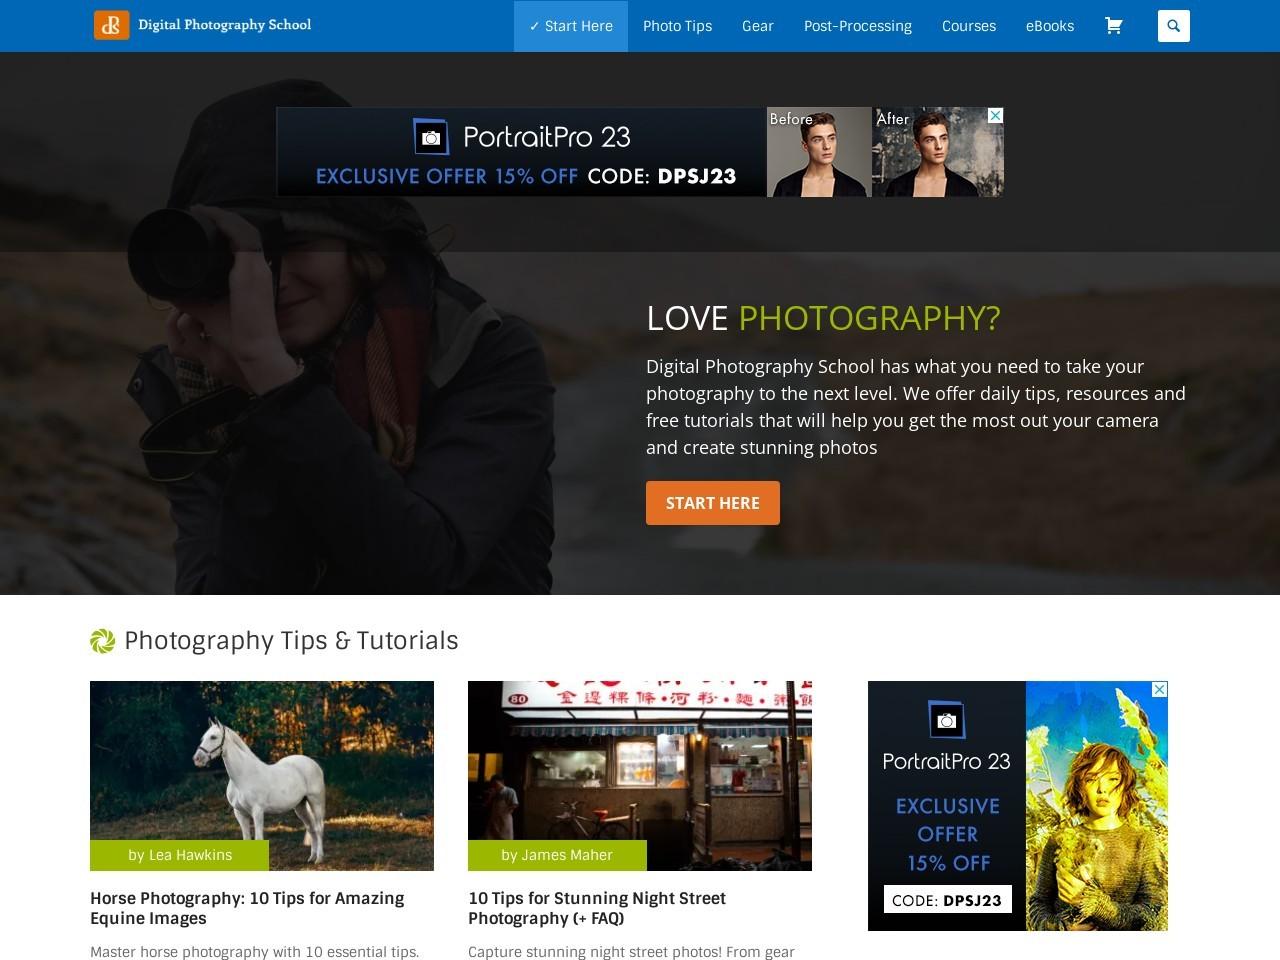 Sony Cyber-Shot DSC-HX50V Review – Digital Photography School